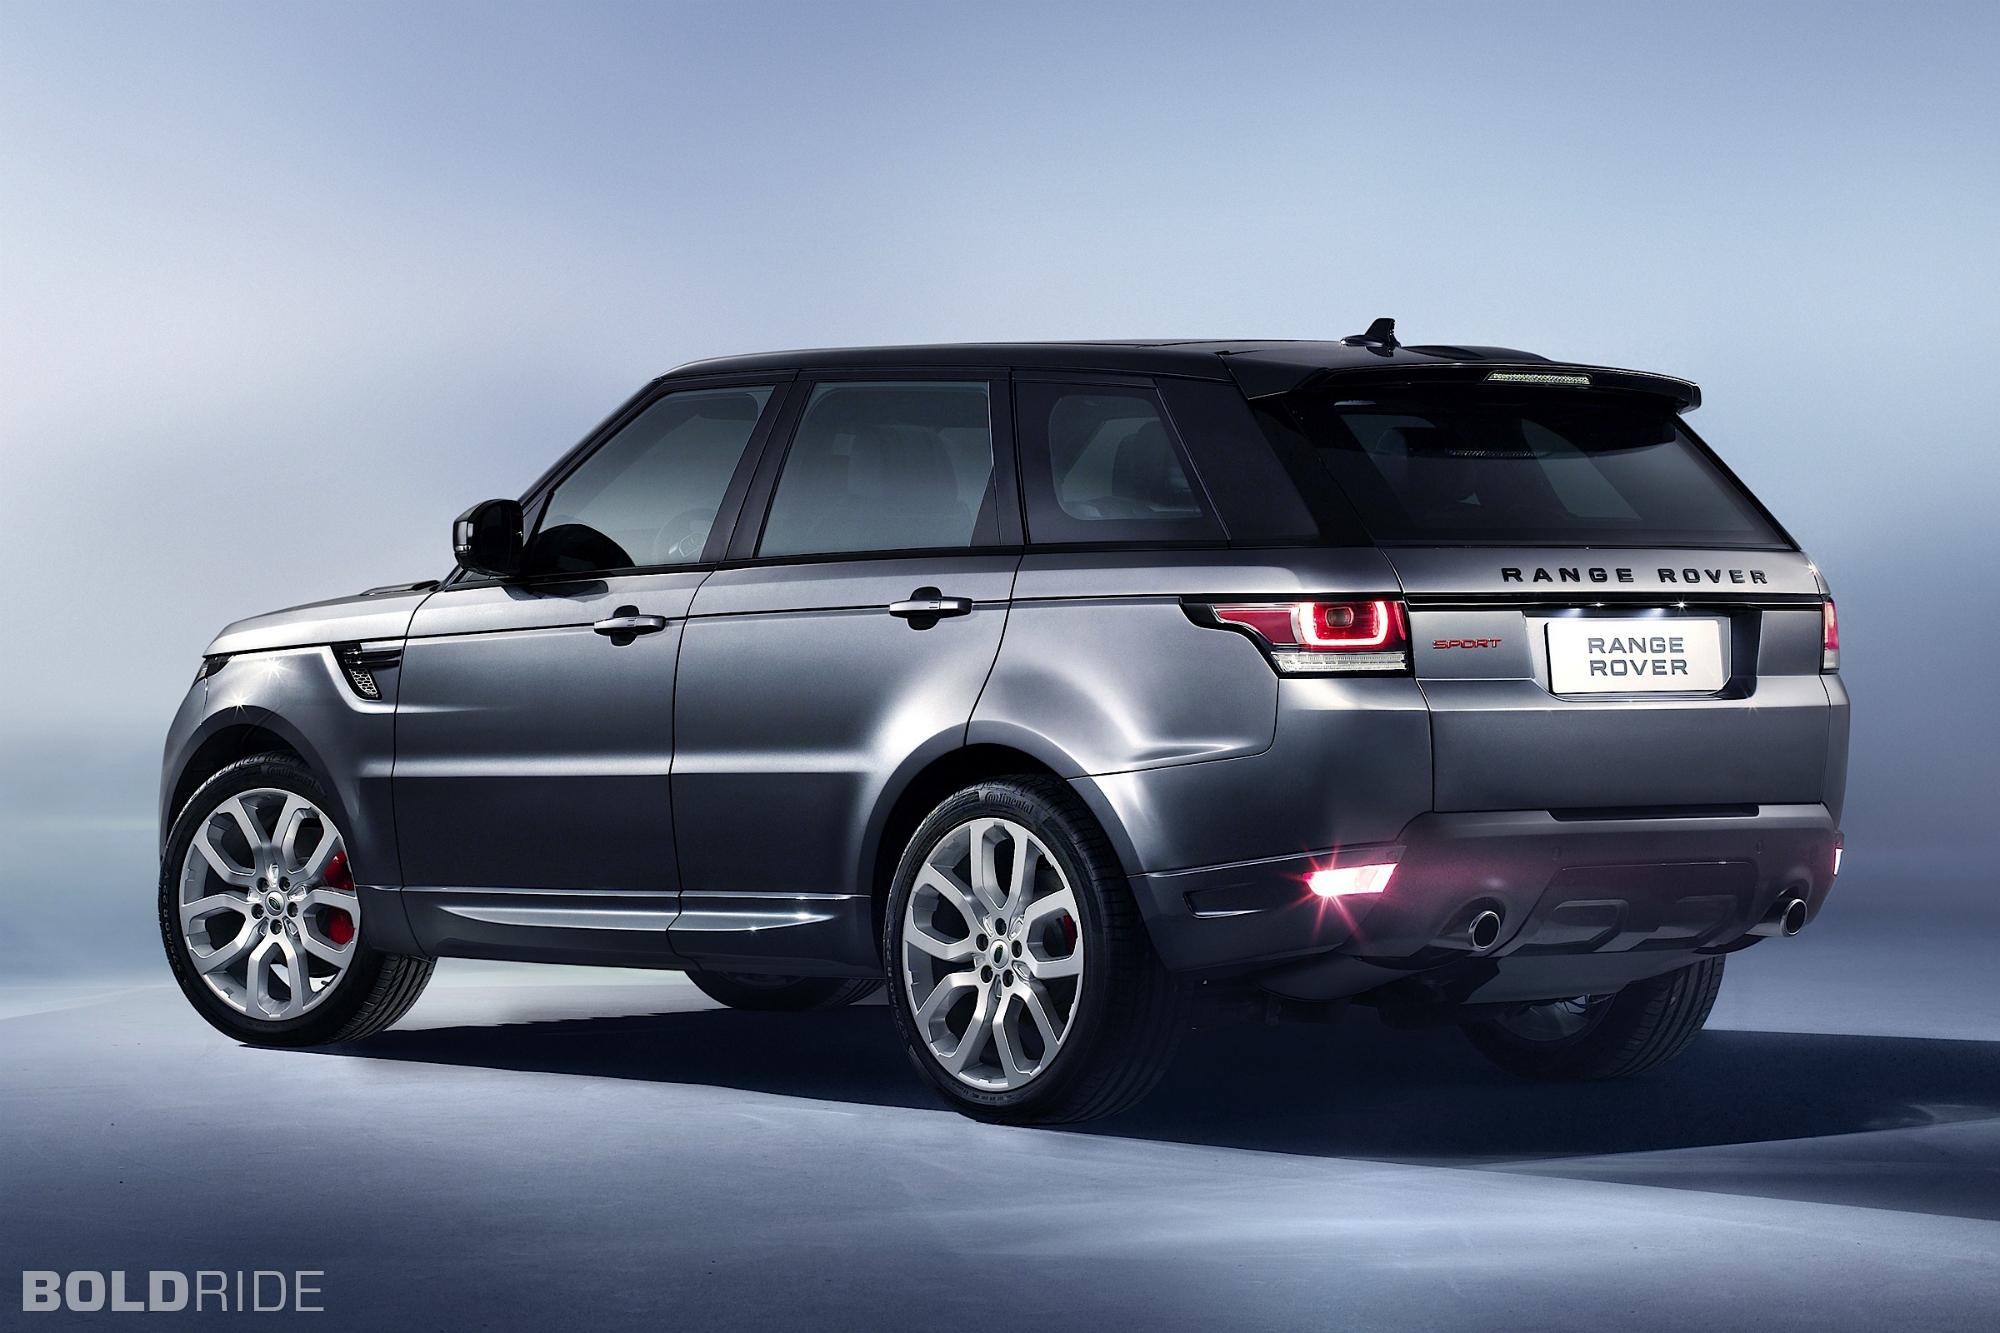 2014 Land Rover Range Rover Sport 1600 x 1200